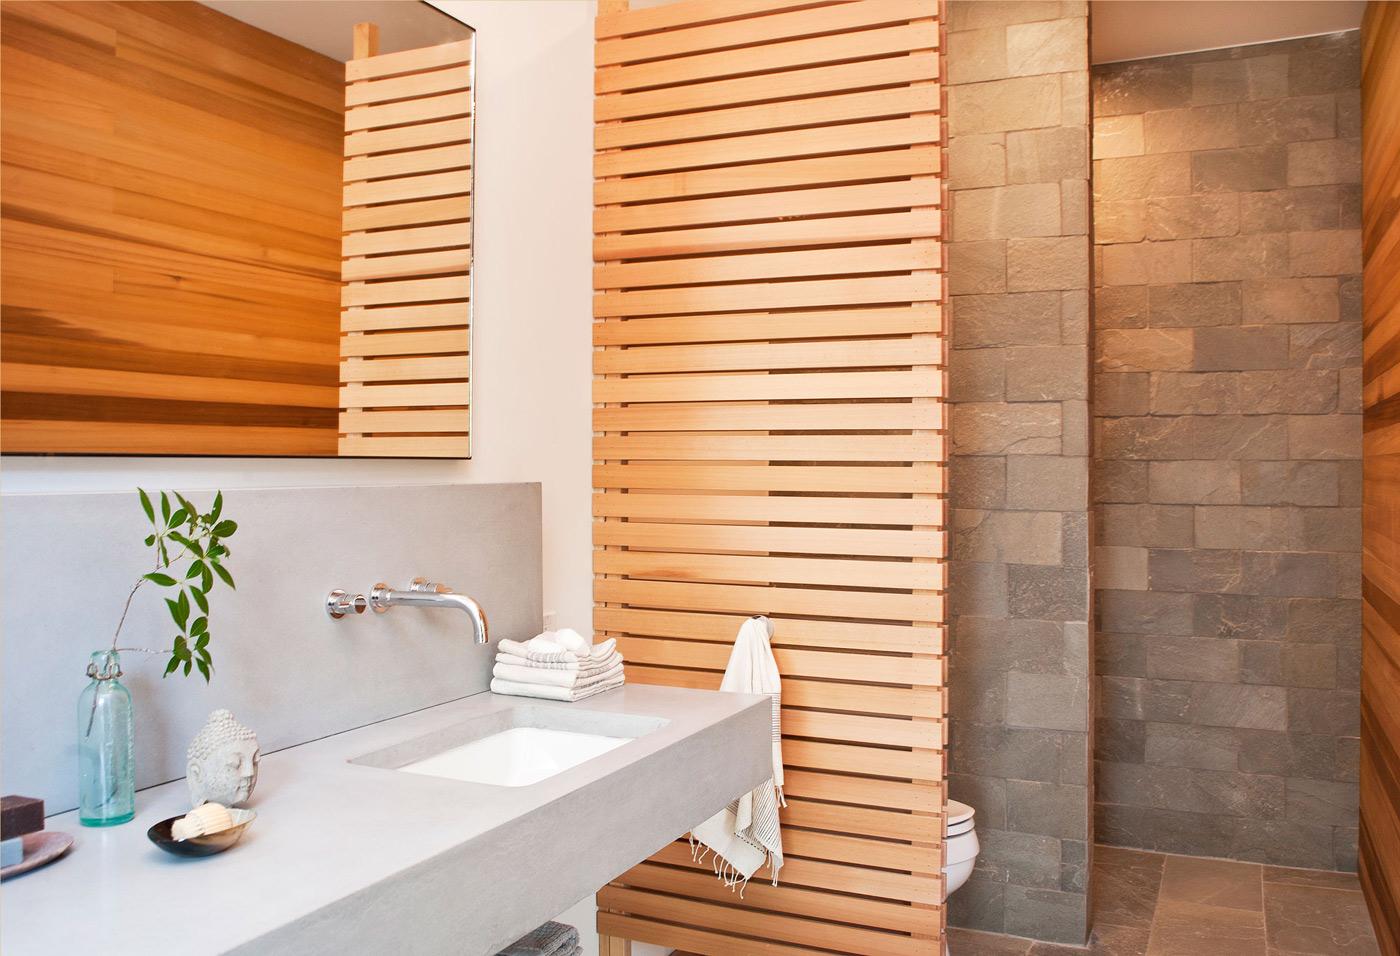 Stone & Wood Bathroom, Wood and Glass House in Kerhonkson